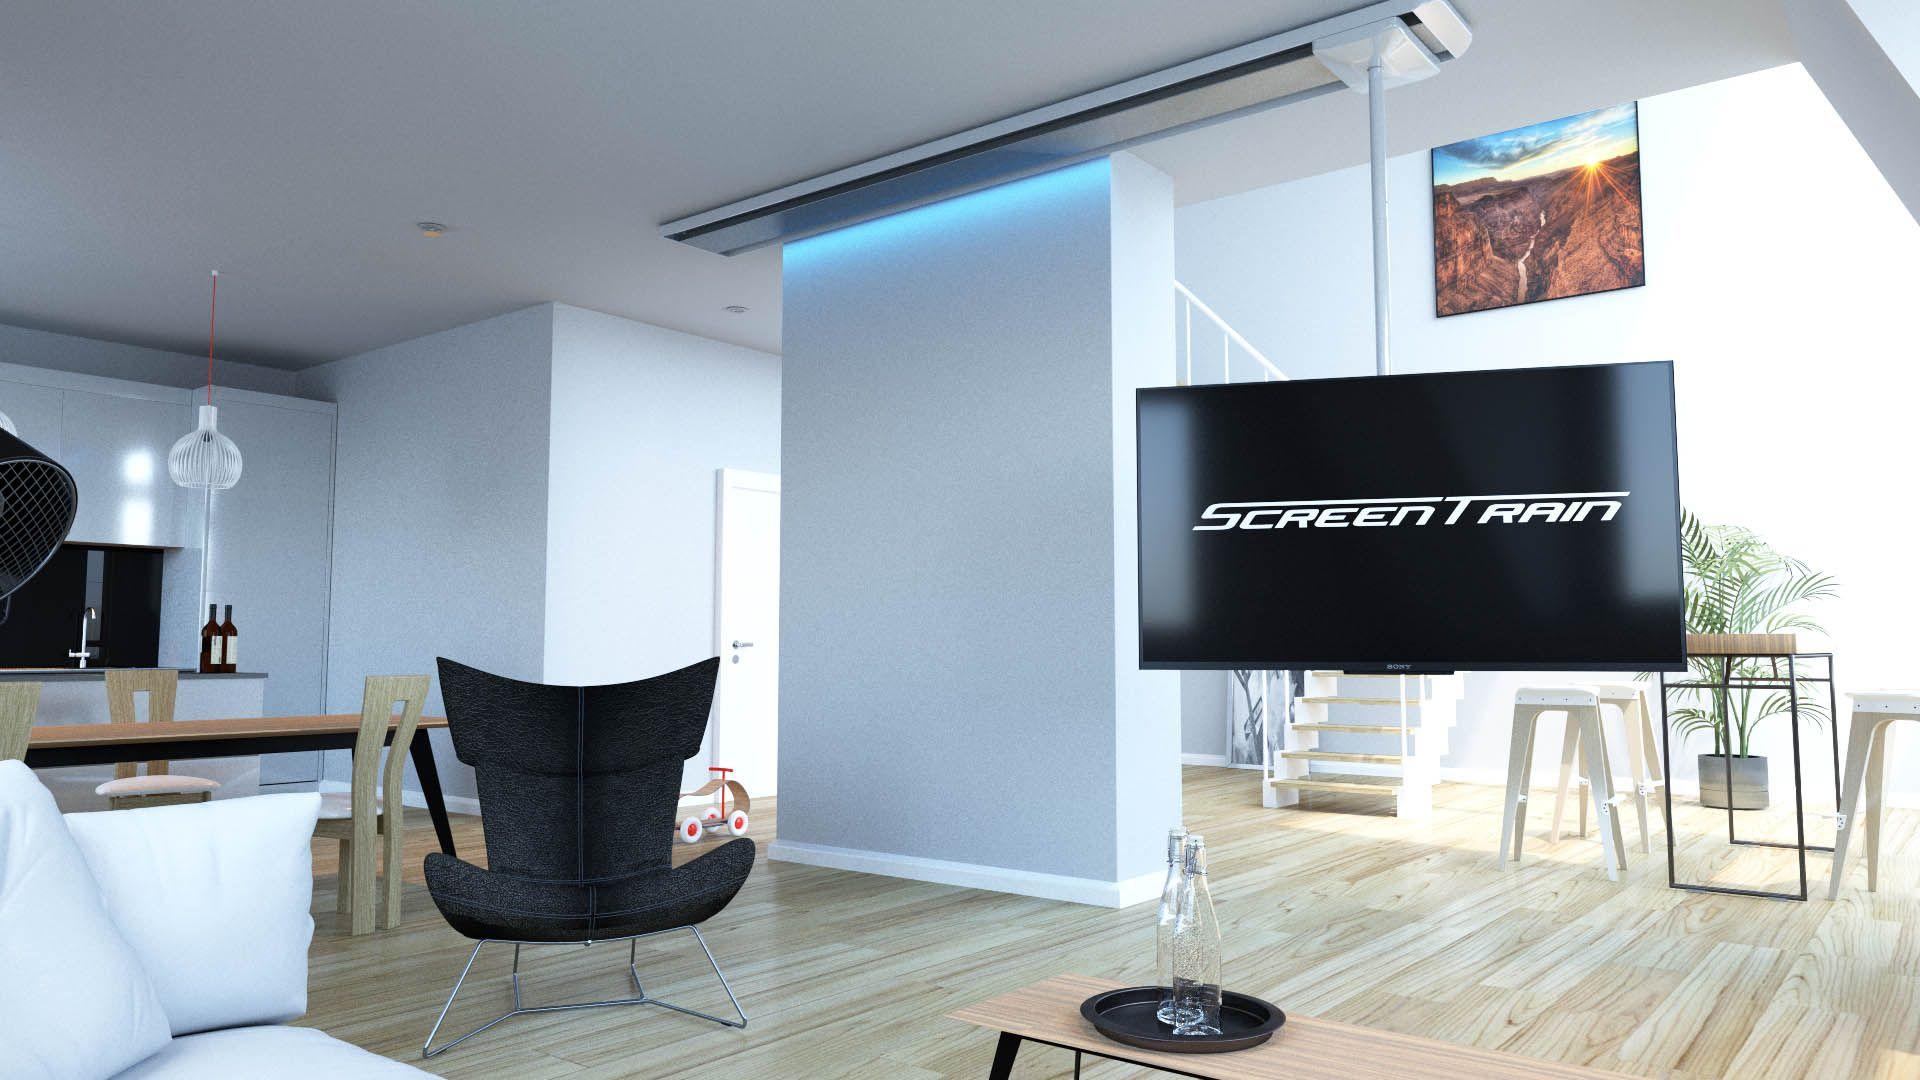 Tv Halterung Fur Decke Verschiebbar Drehbar Neigbar Mit Optionaler Led Beleuchtung Tv Ceiling Mount Tv Halterung Tv Halterung Decke Tv Halterung Schwenkbar